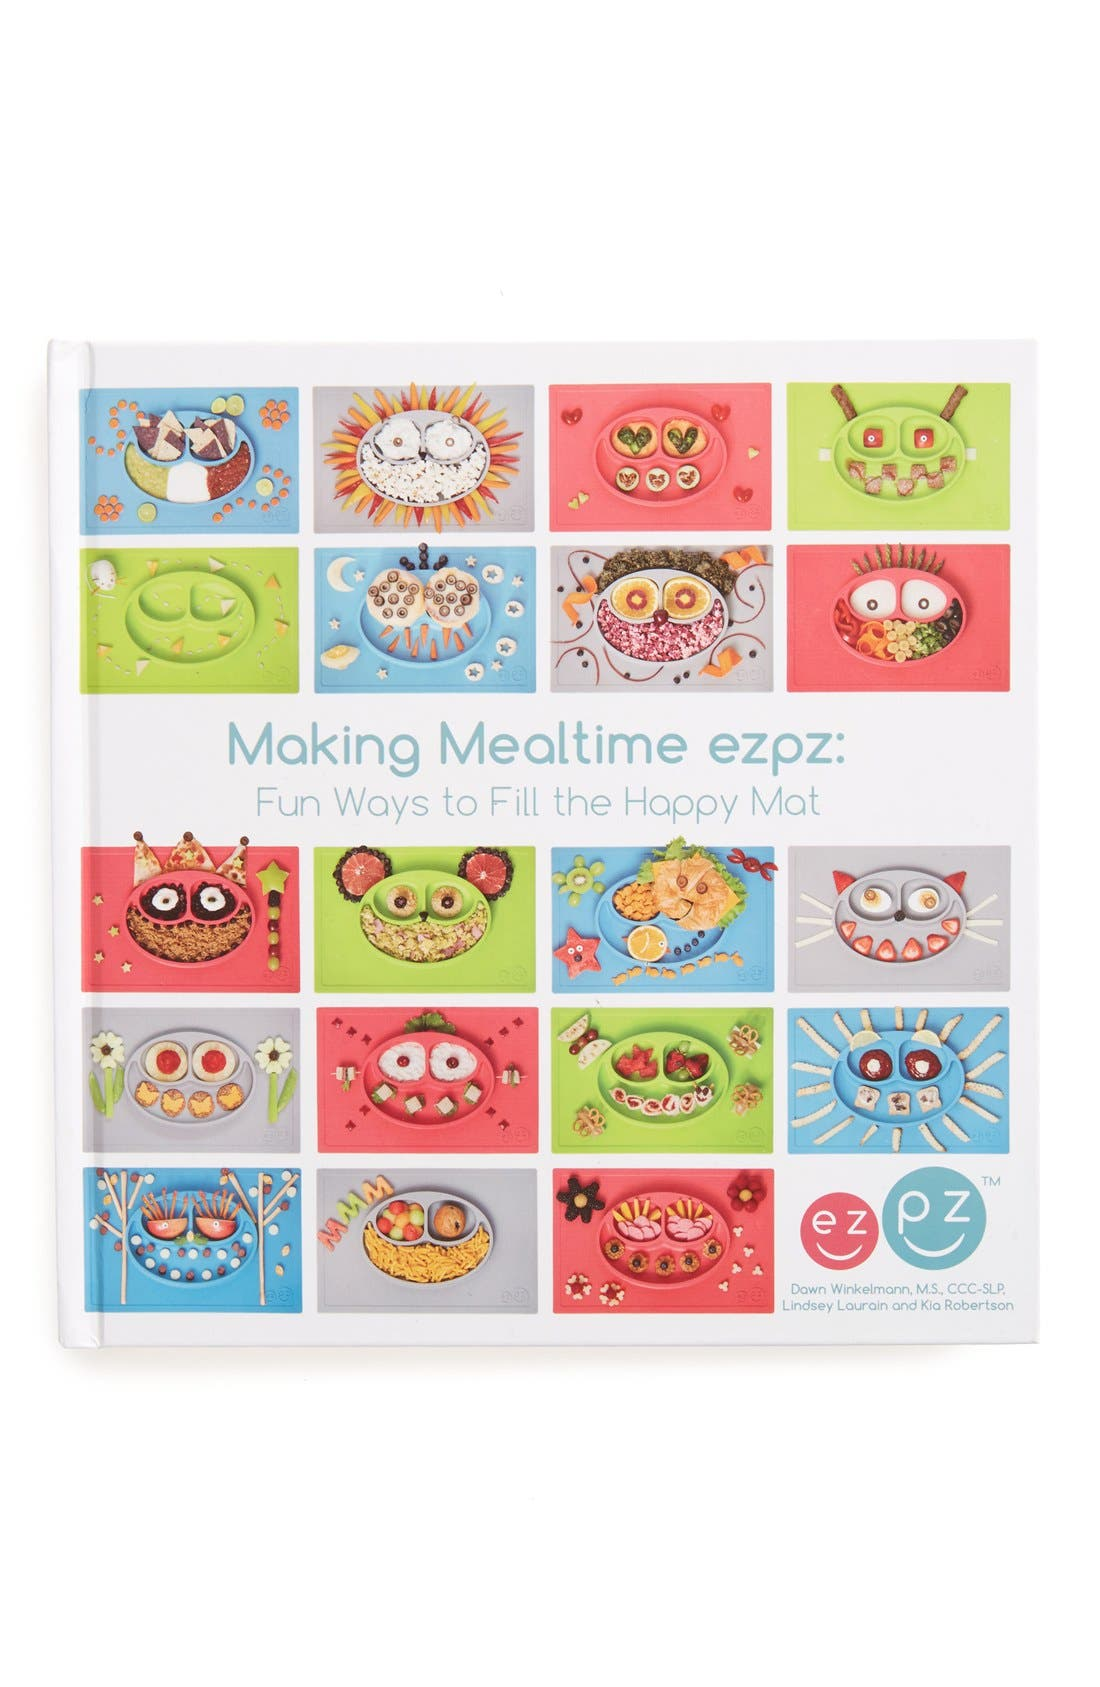 Making Mealtime ezpz: Fun Ways to Fill the Happy Mat Book